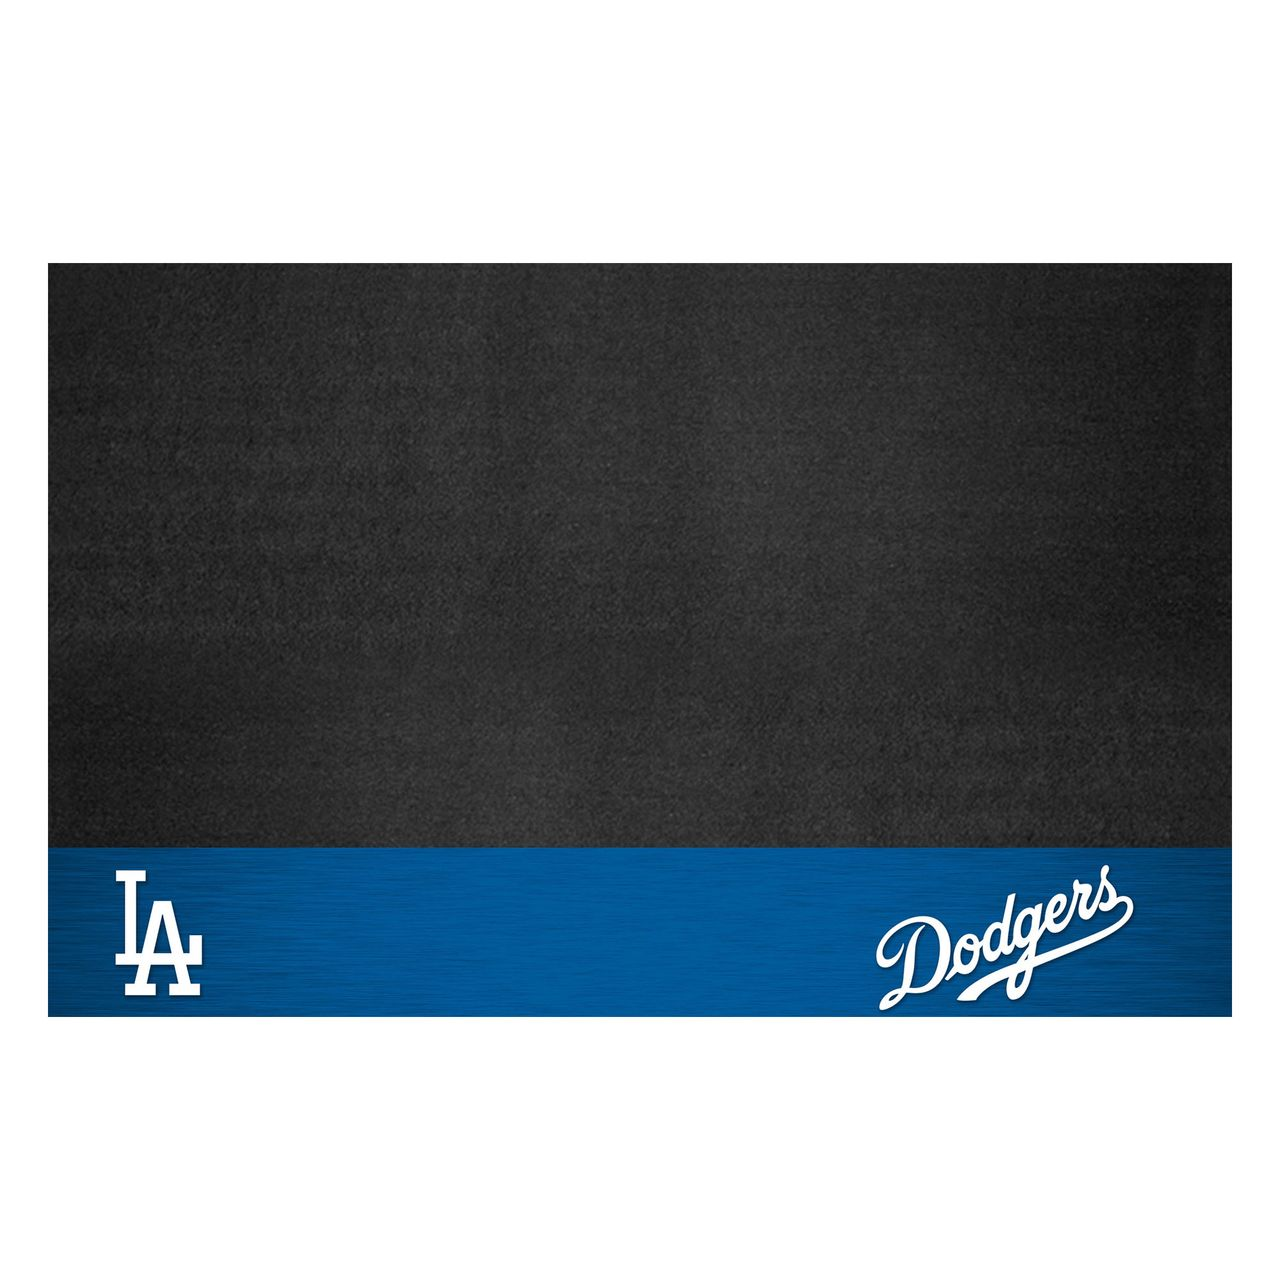 "MLB - Los Angeles Dodgers Grill Mat 26"" x 42"""